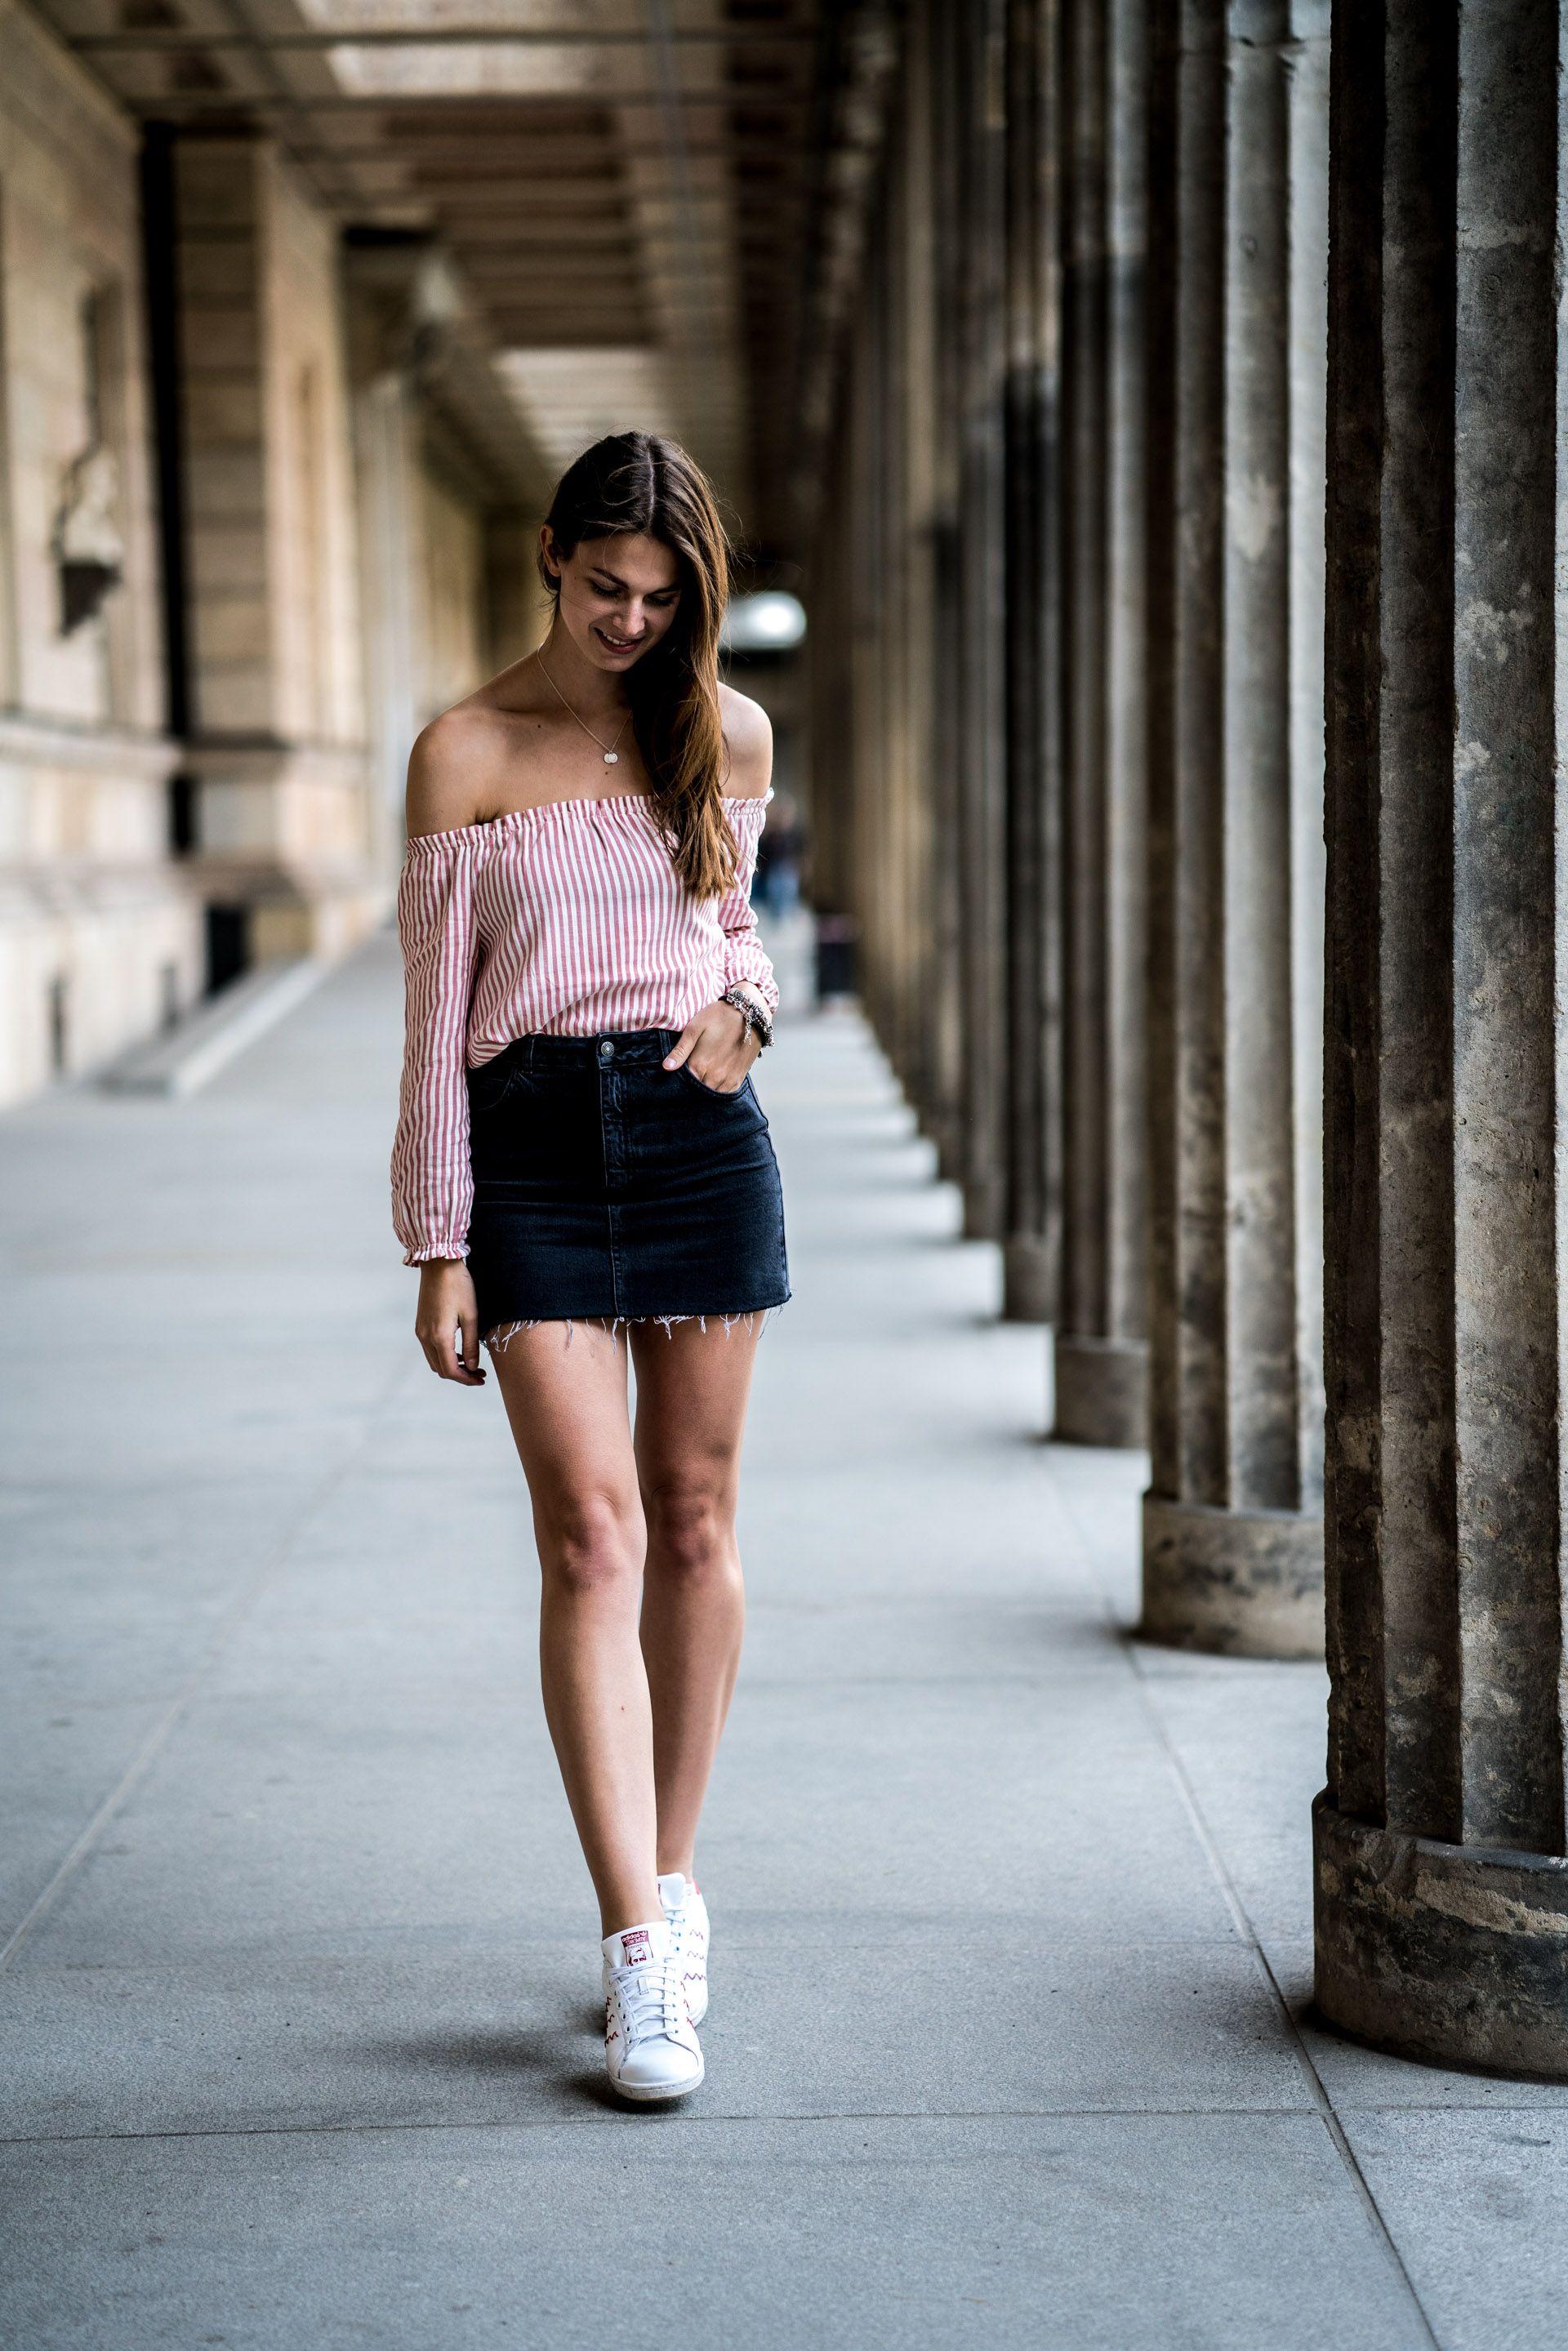 529cdb2a0a Denim Skirt Outfits Summer – DACC